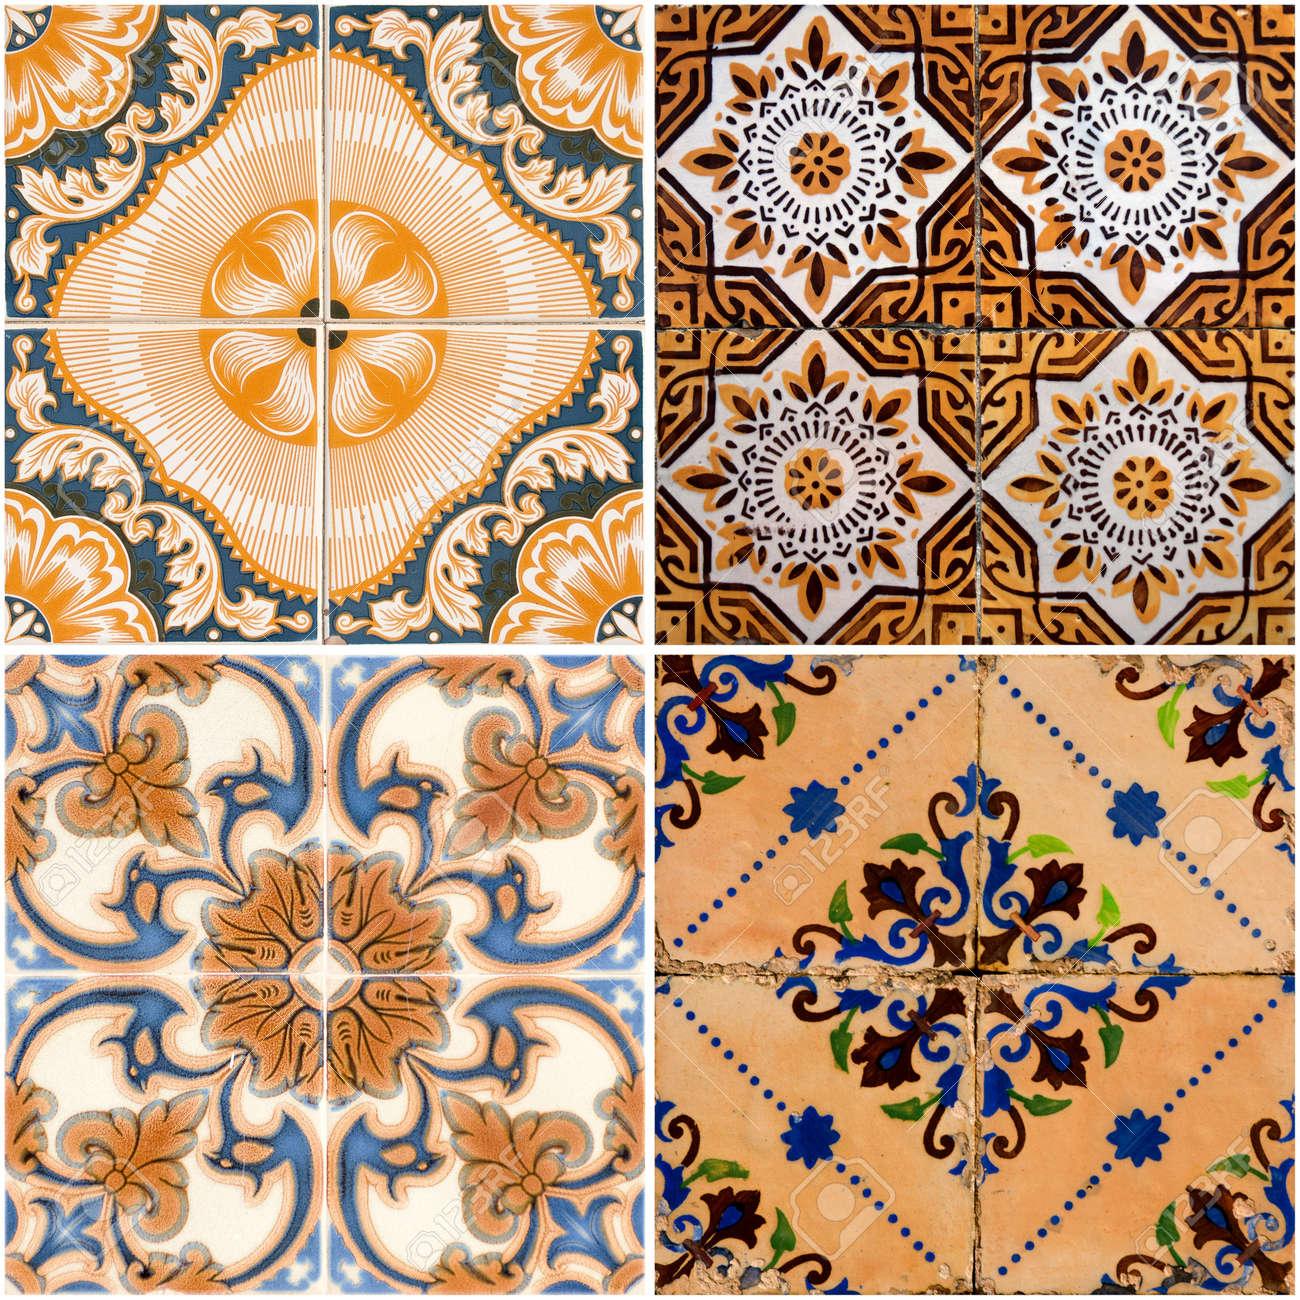 Colorful vintage ceramic tiles wall decoration  Stock Photo   12725804. Colorful Vintage Ceramic Tiles Wall Decoration  Stock Photo